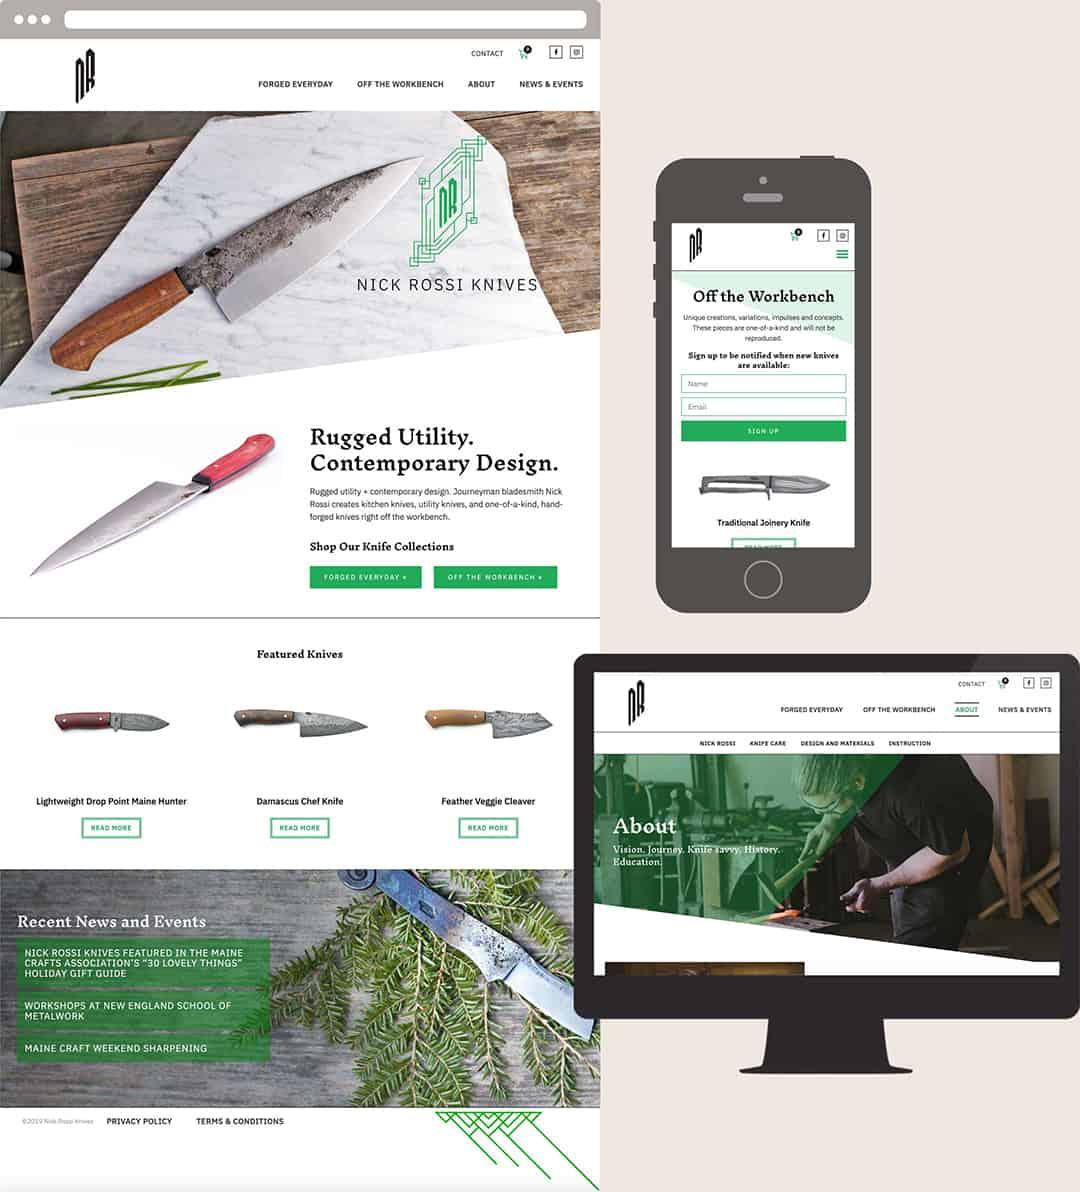 Website Design visuals for NickRossiKnives.com by Upper Notch